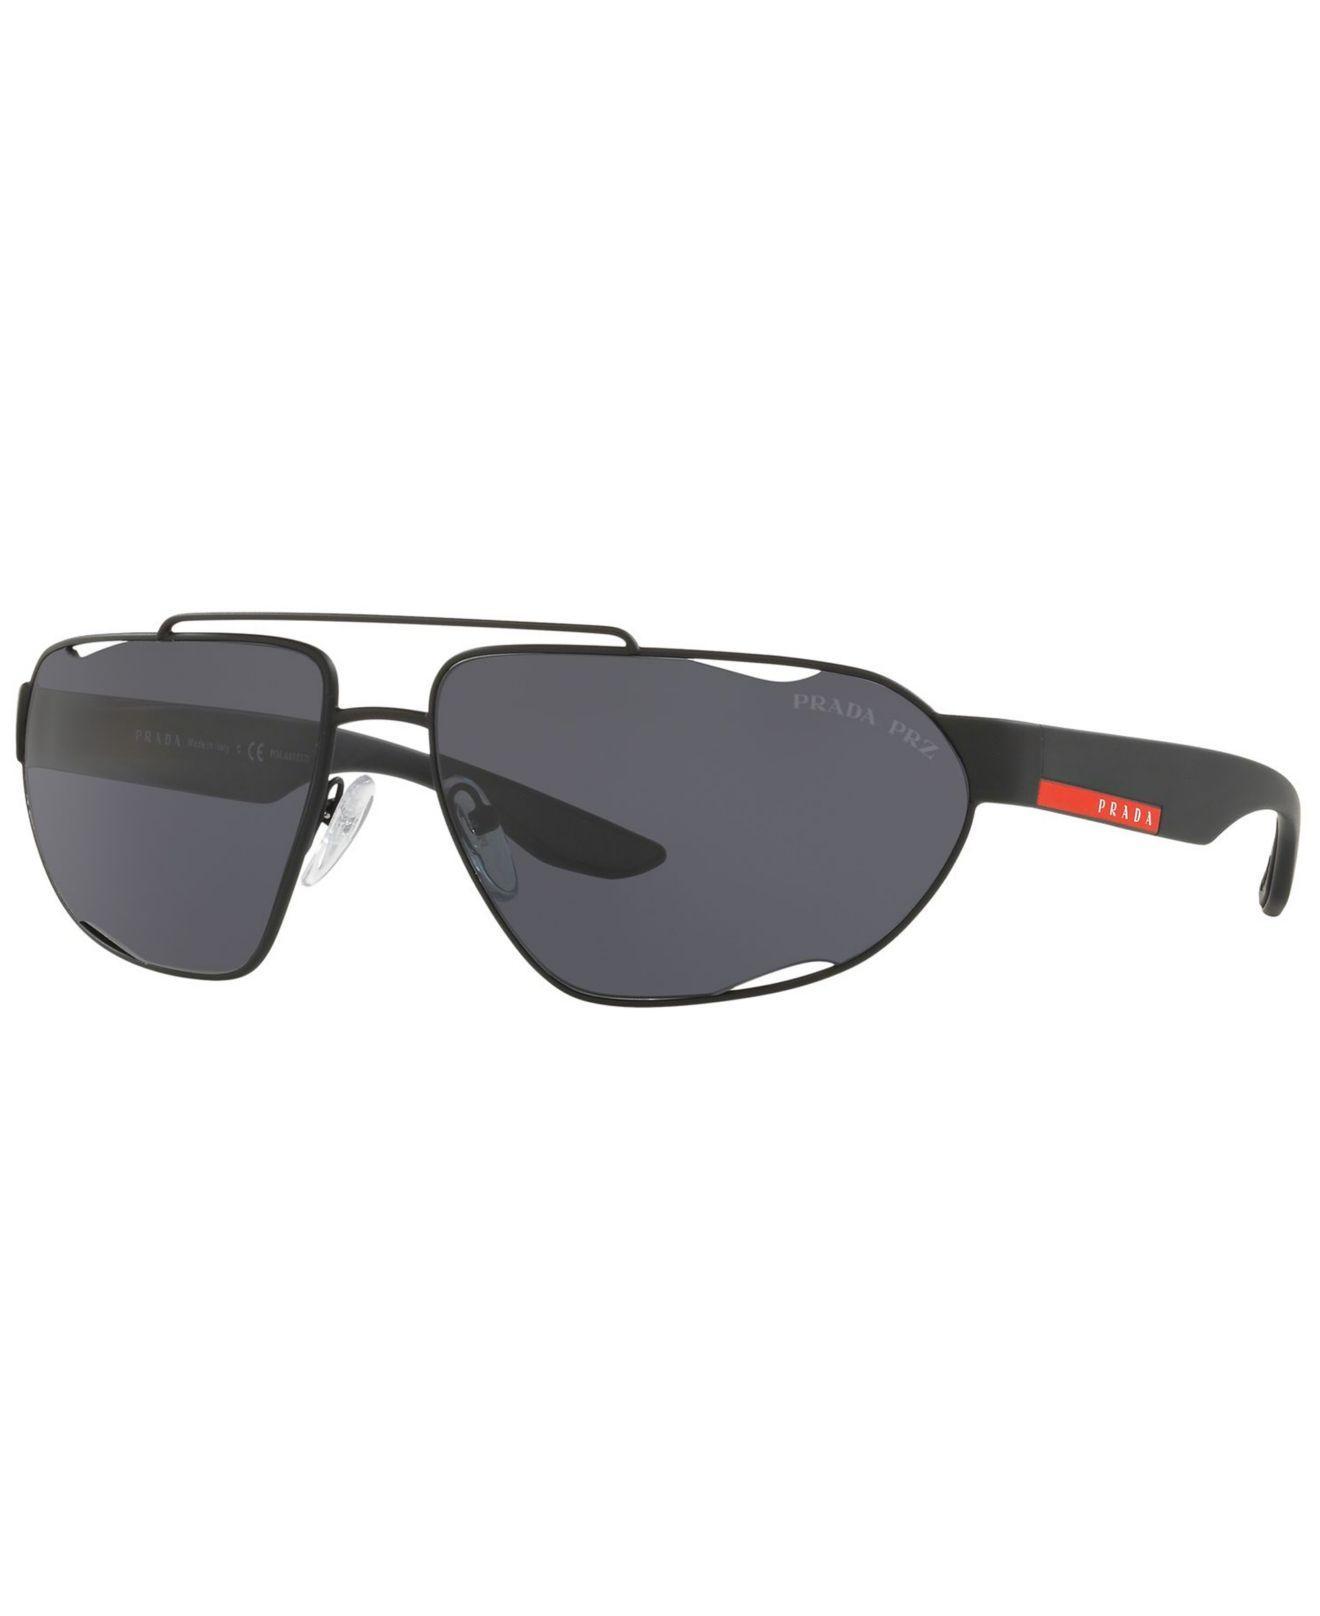 5e047e788d4 Lyst - Prada Polarized Sunglasses